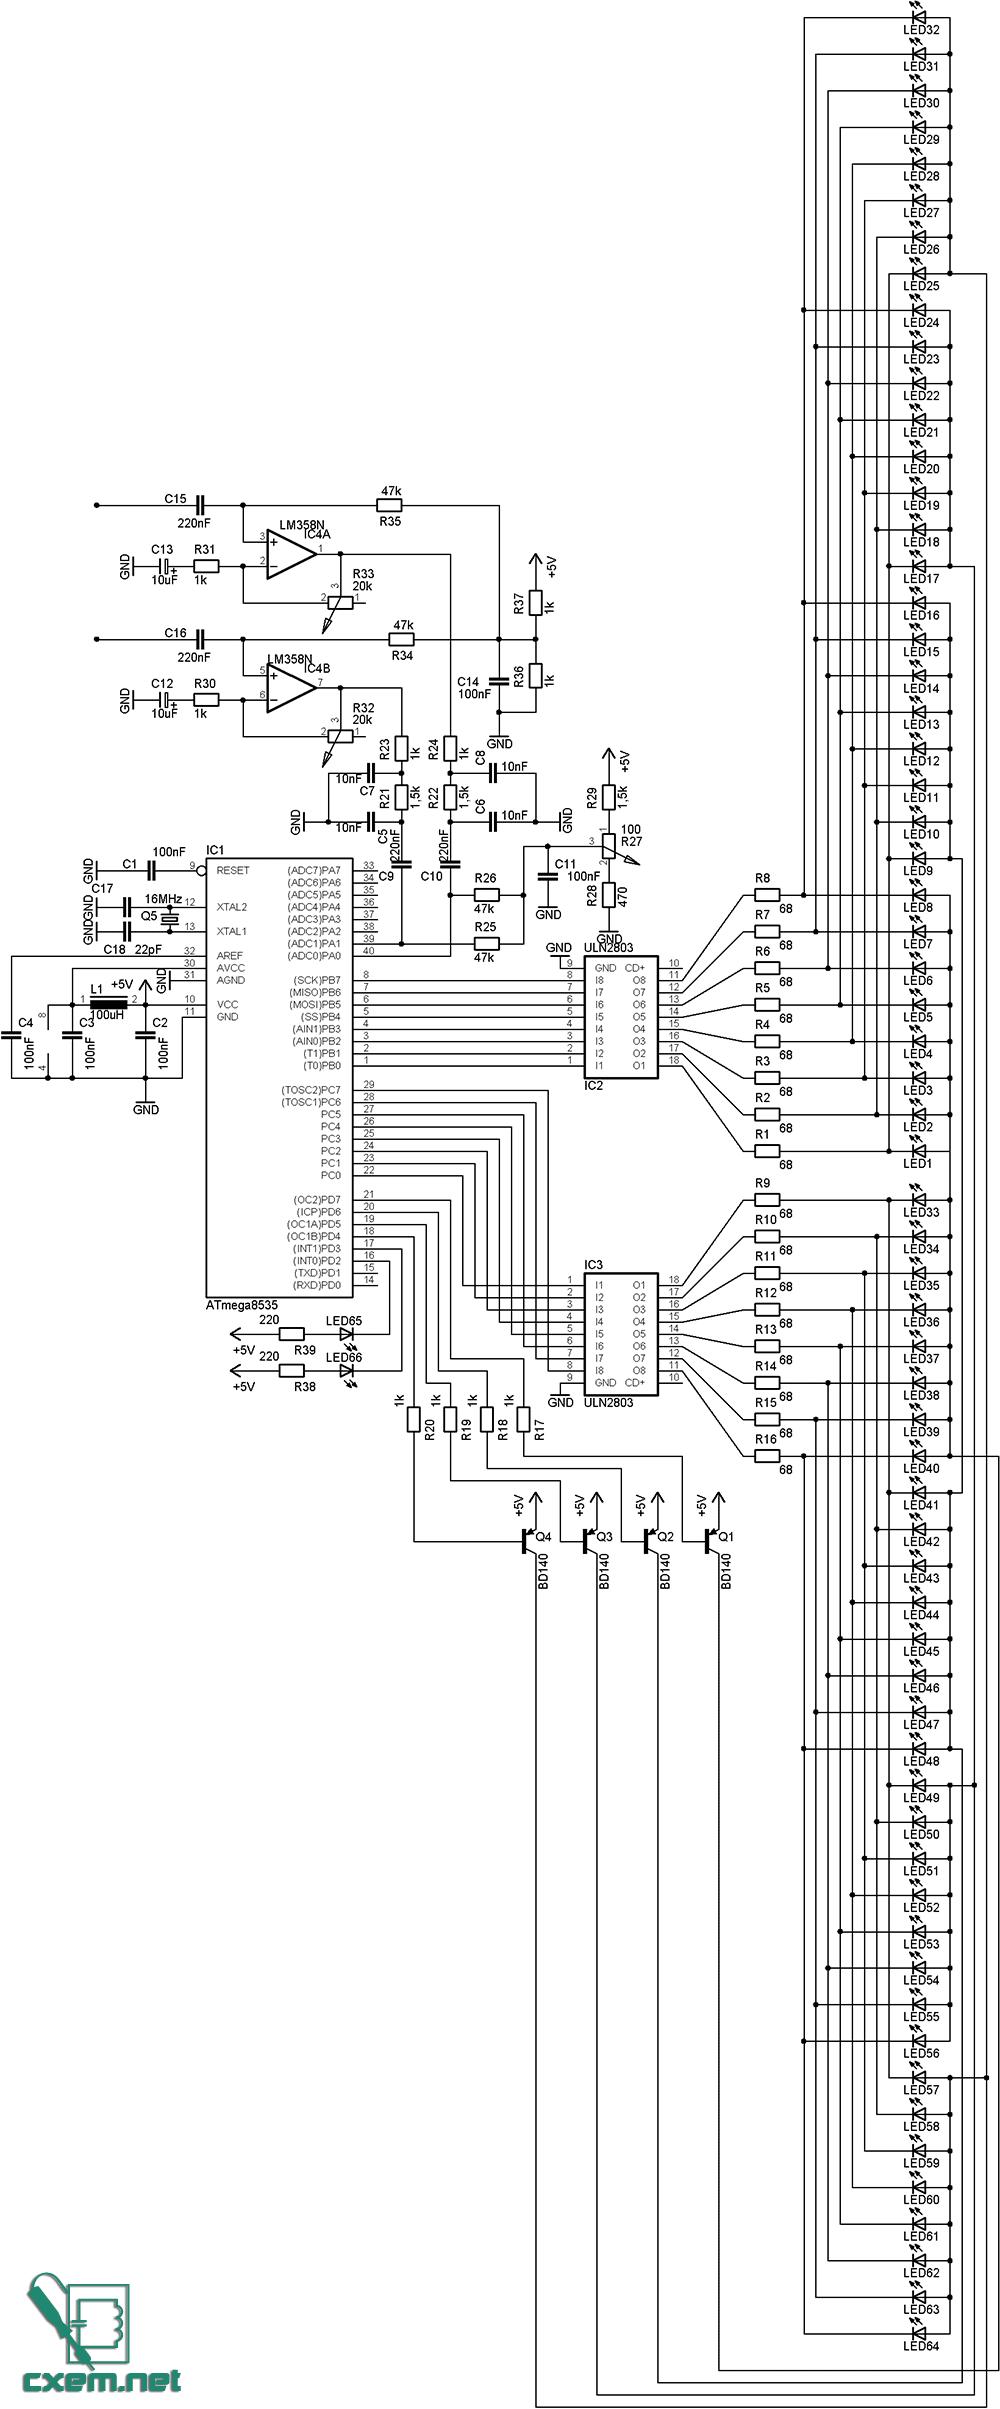 Схема светодиодного индикатора сигнала фото 392